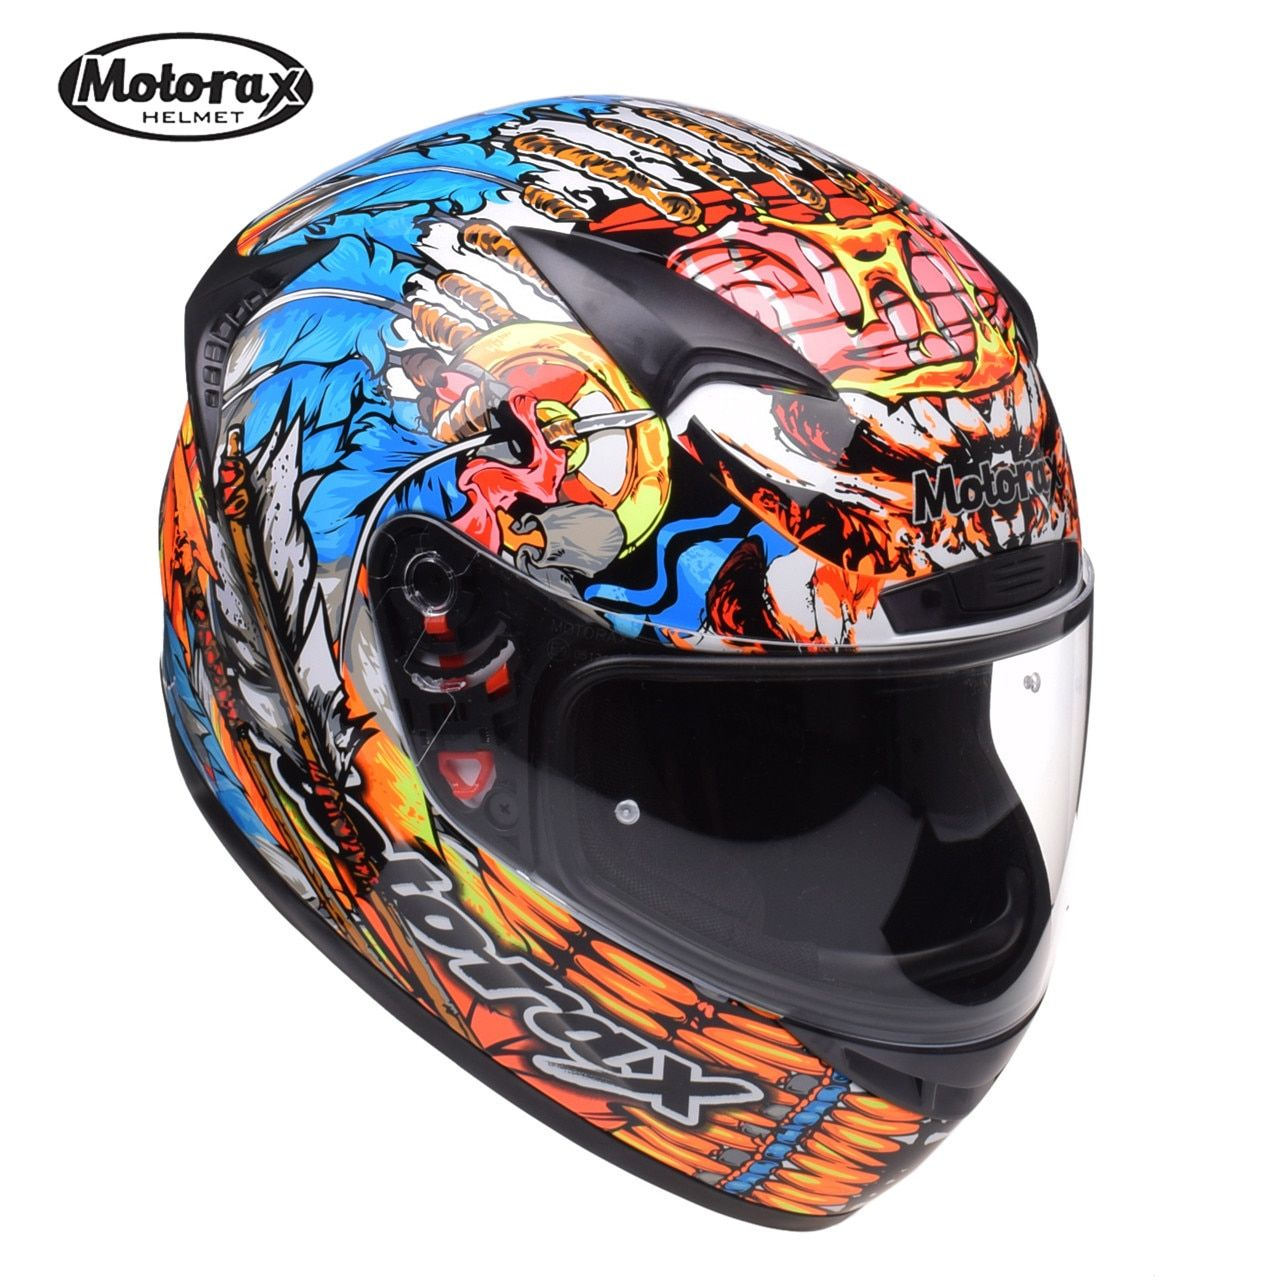 MOTORAX TR30 Indische Racing Motorrad Helm Full Face Capacete Casco Casque Moto Helm Helme Kask Crash Für Honda Motorsiklet